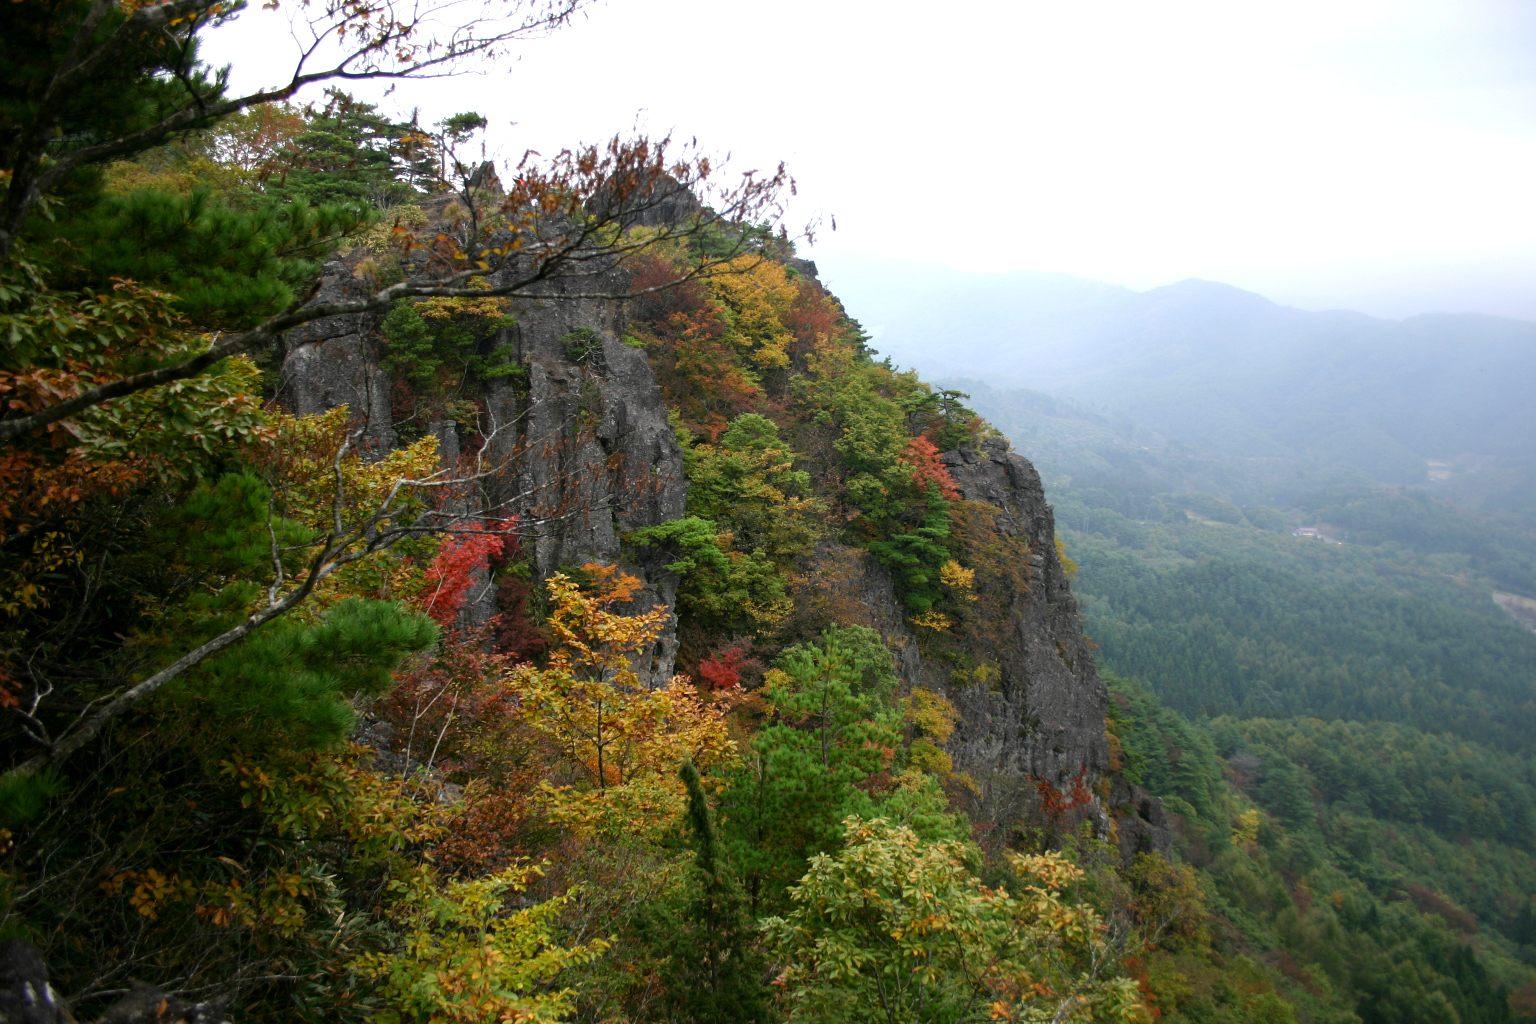 Mount Ryo having a long history